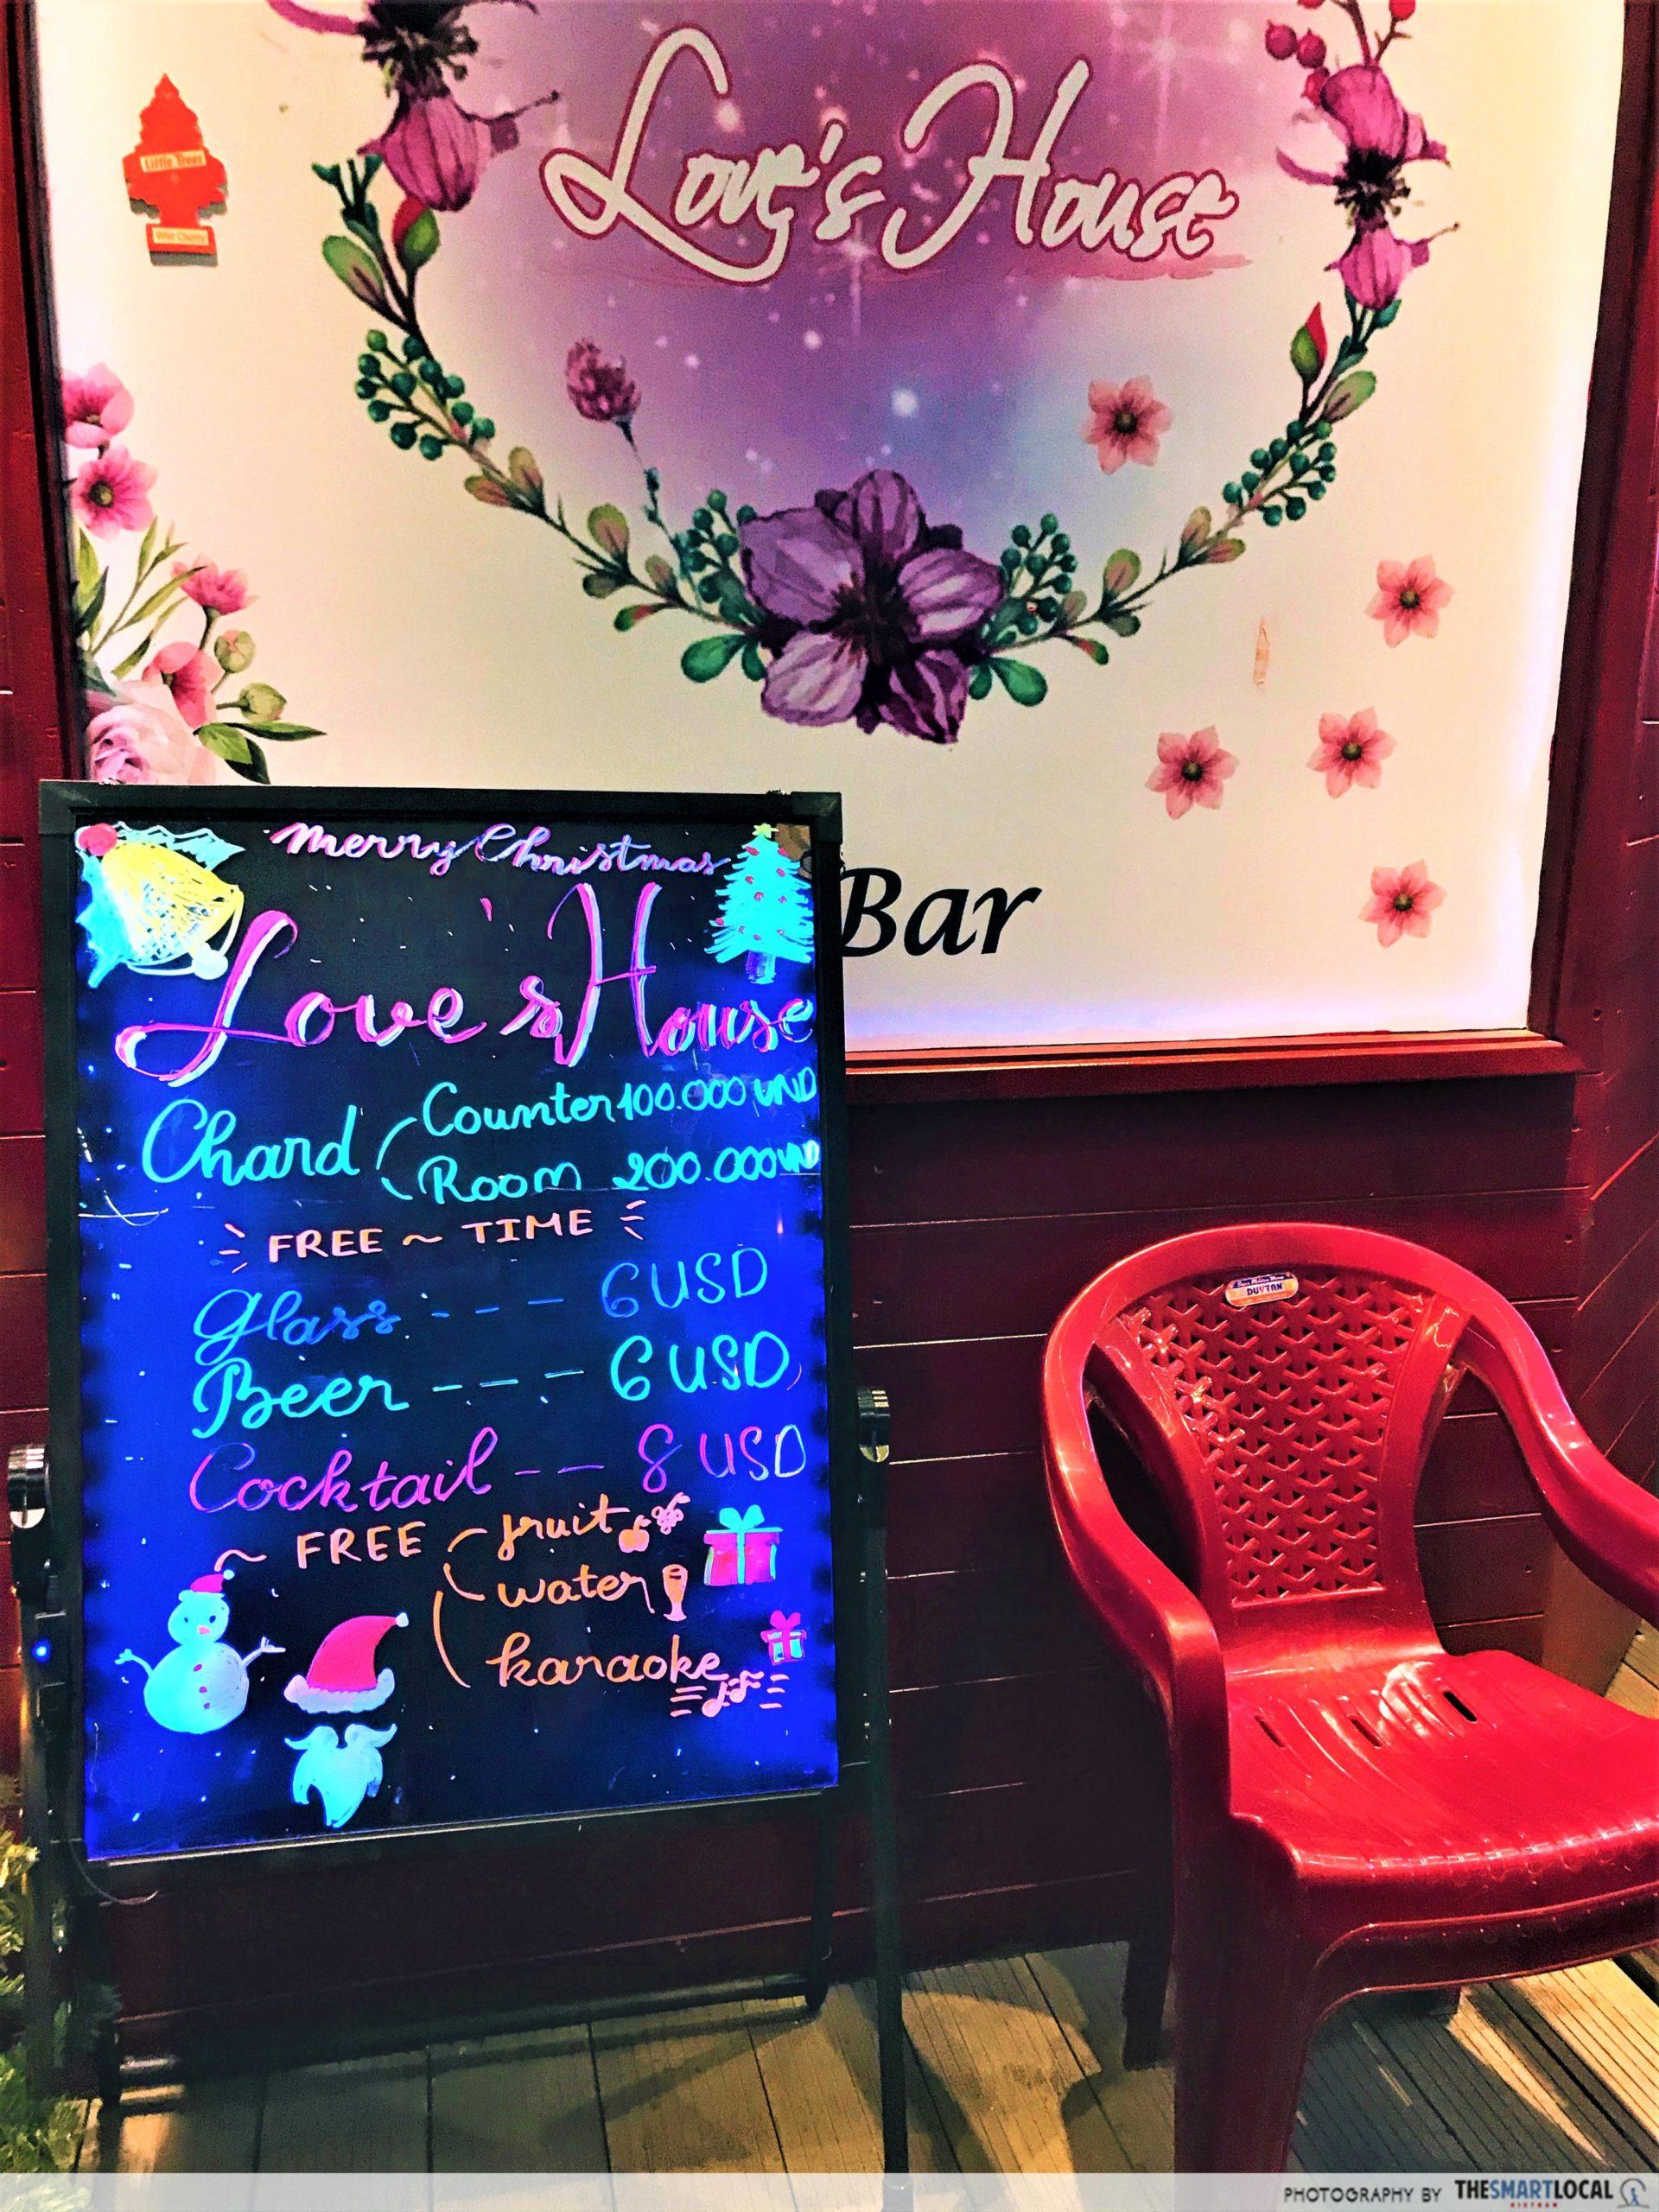 Japan Town LOVE BAR